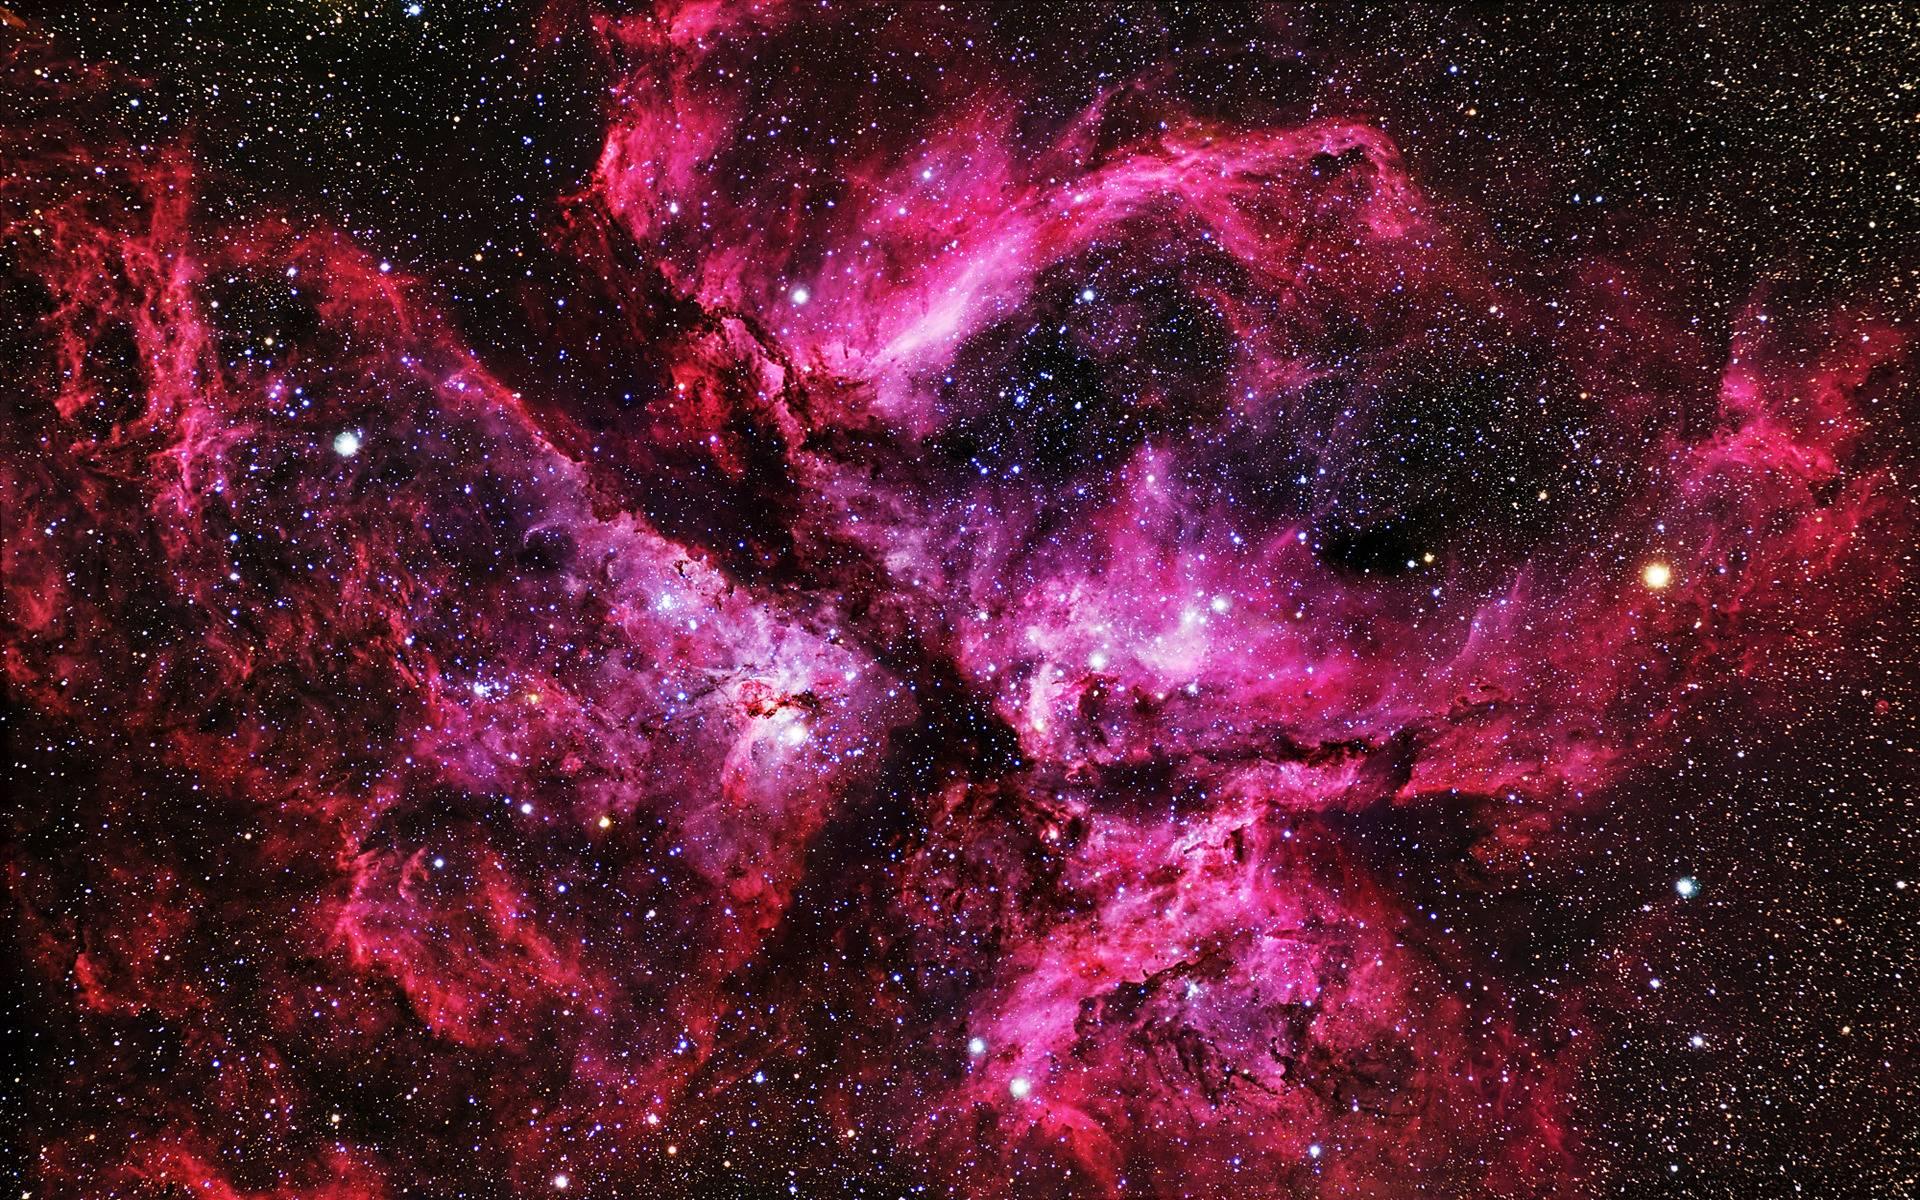 Galaxy Wallpaper Tumblr - Carina Nebula , HD Wallpaper & Backgrounds